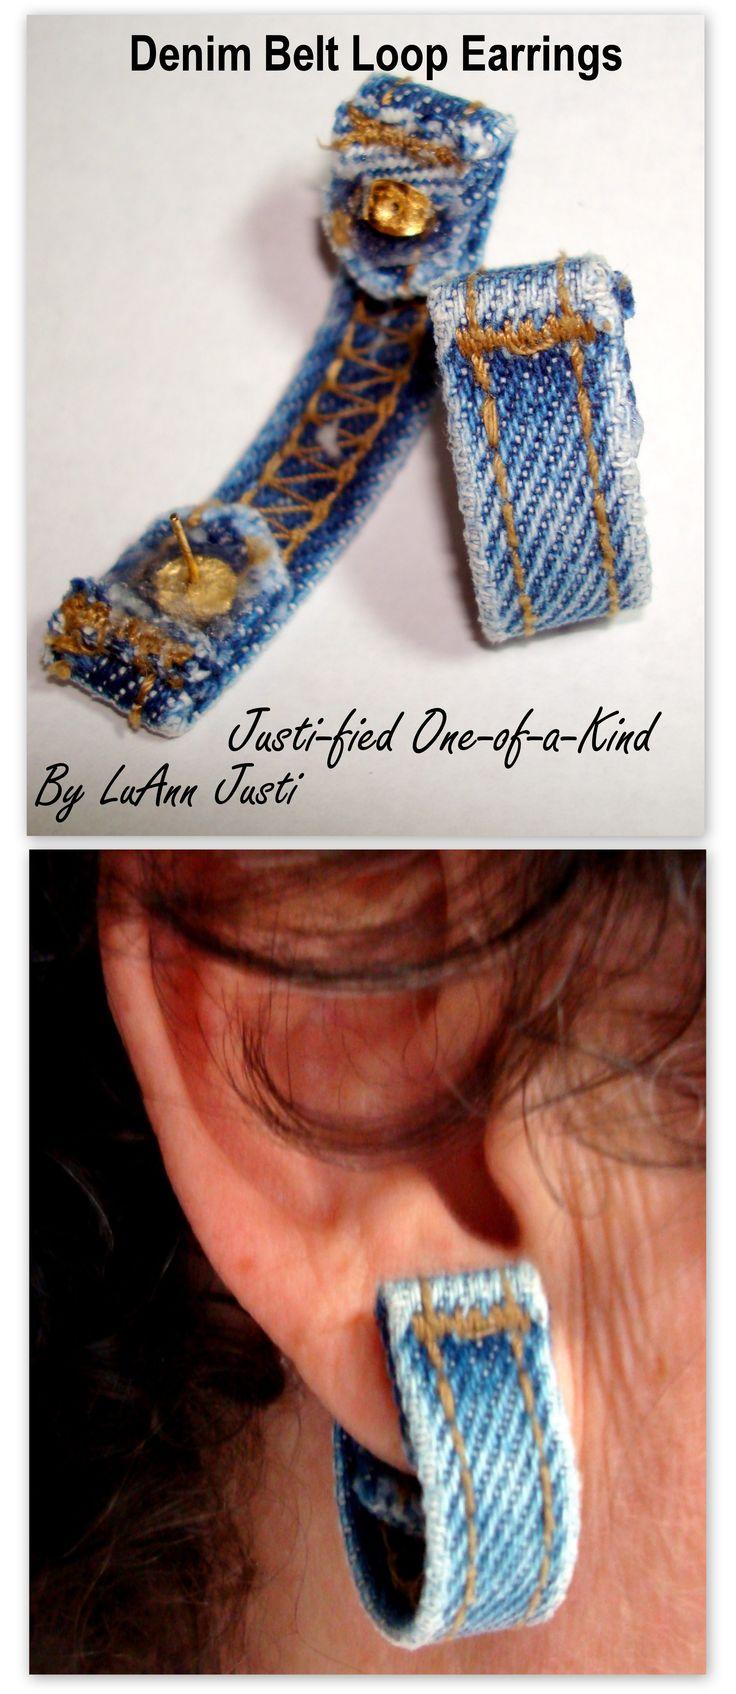 Denim Belt Loop Earrings DIY craft +++ Manualidad #pendientes  #tela de reciclar tela de pantalones jeans tejanos reaprovechado